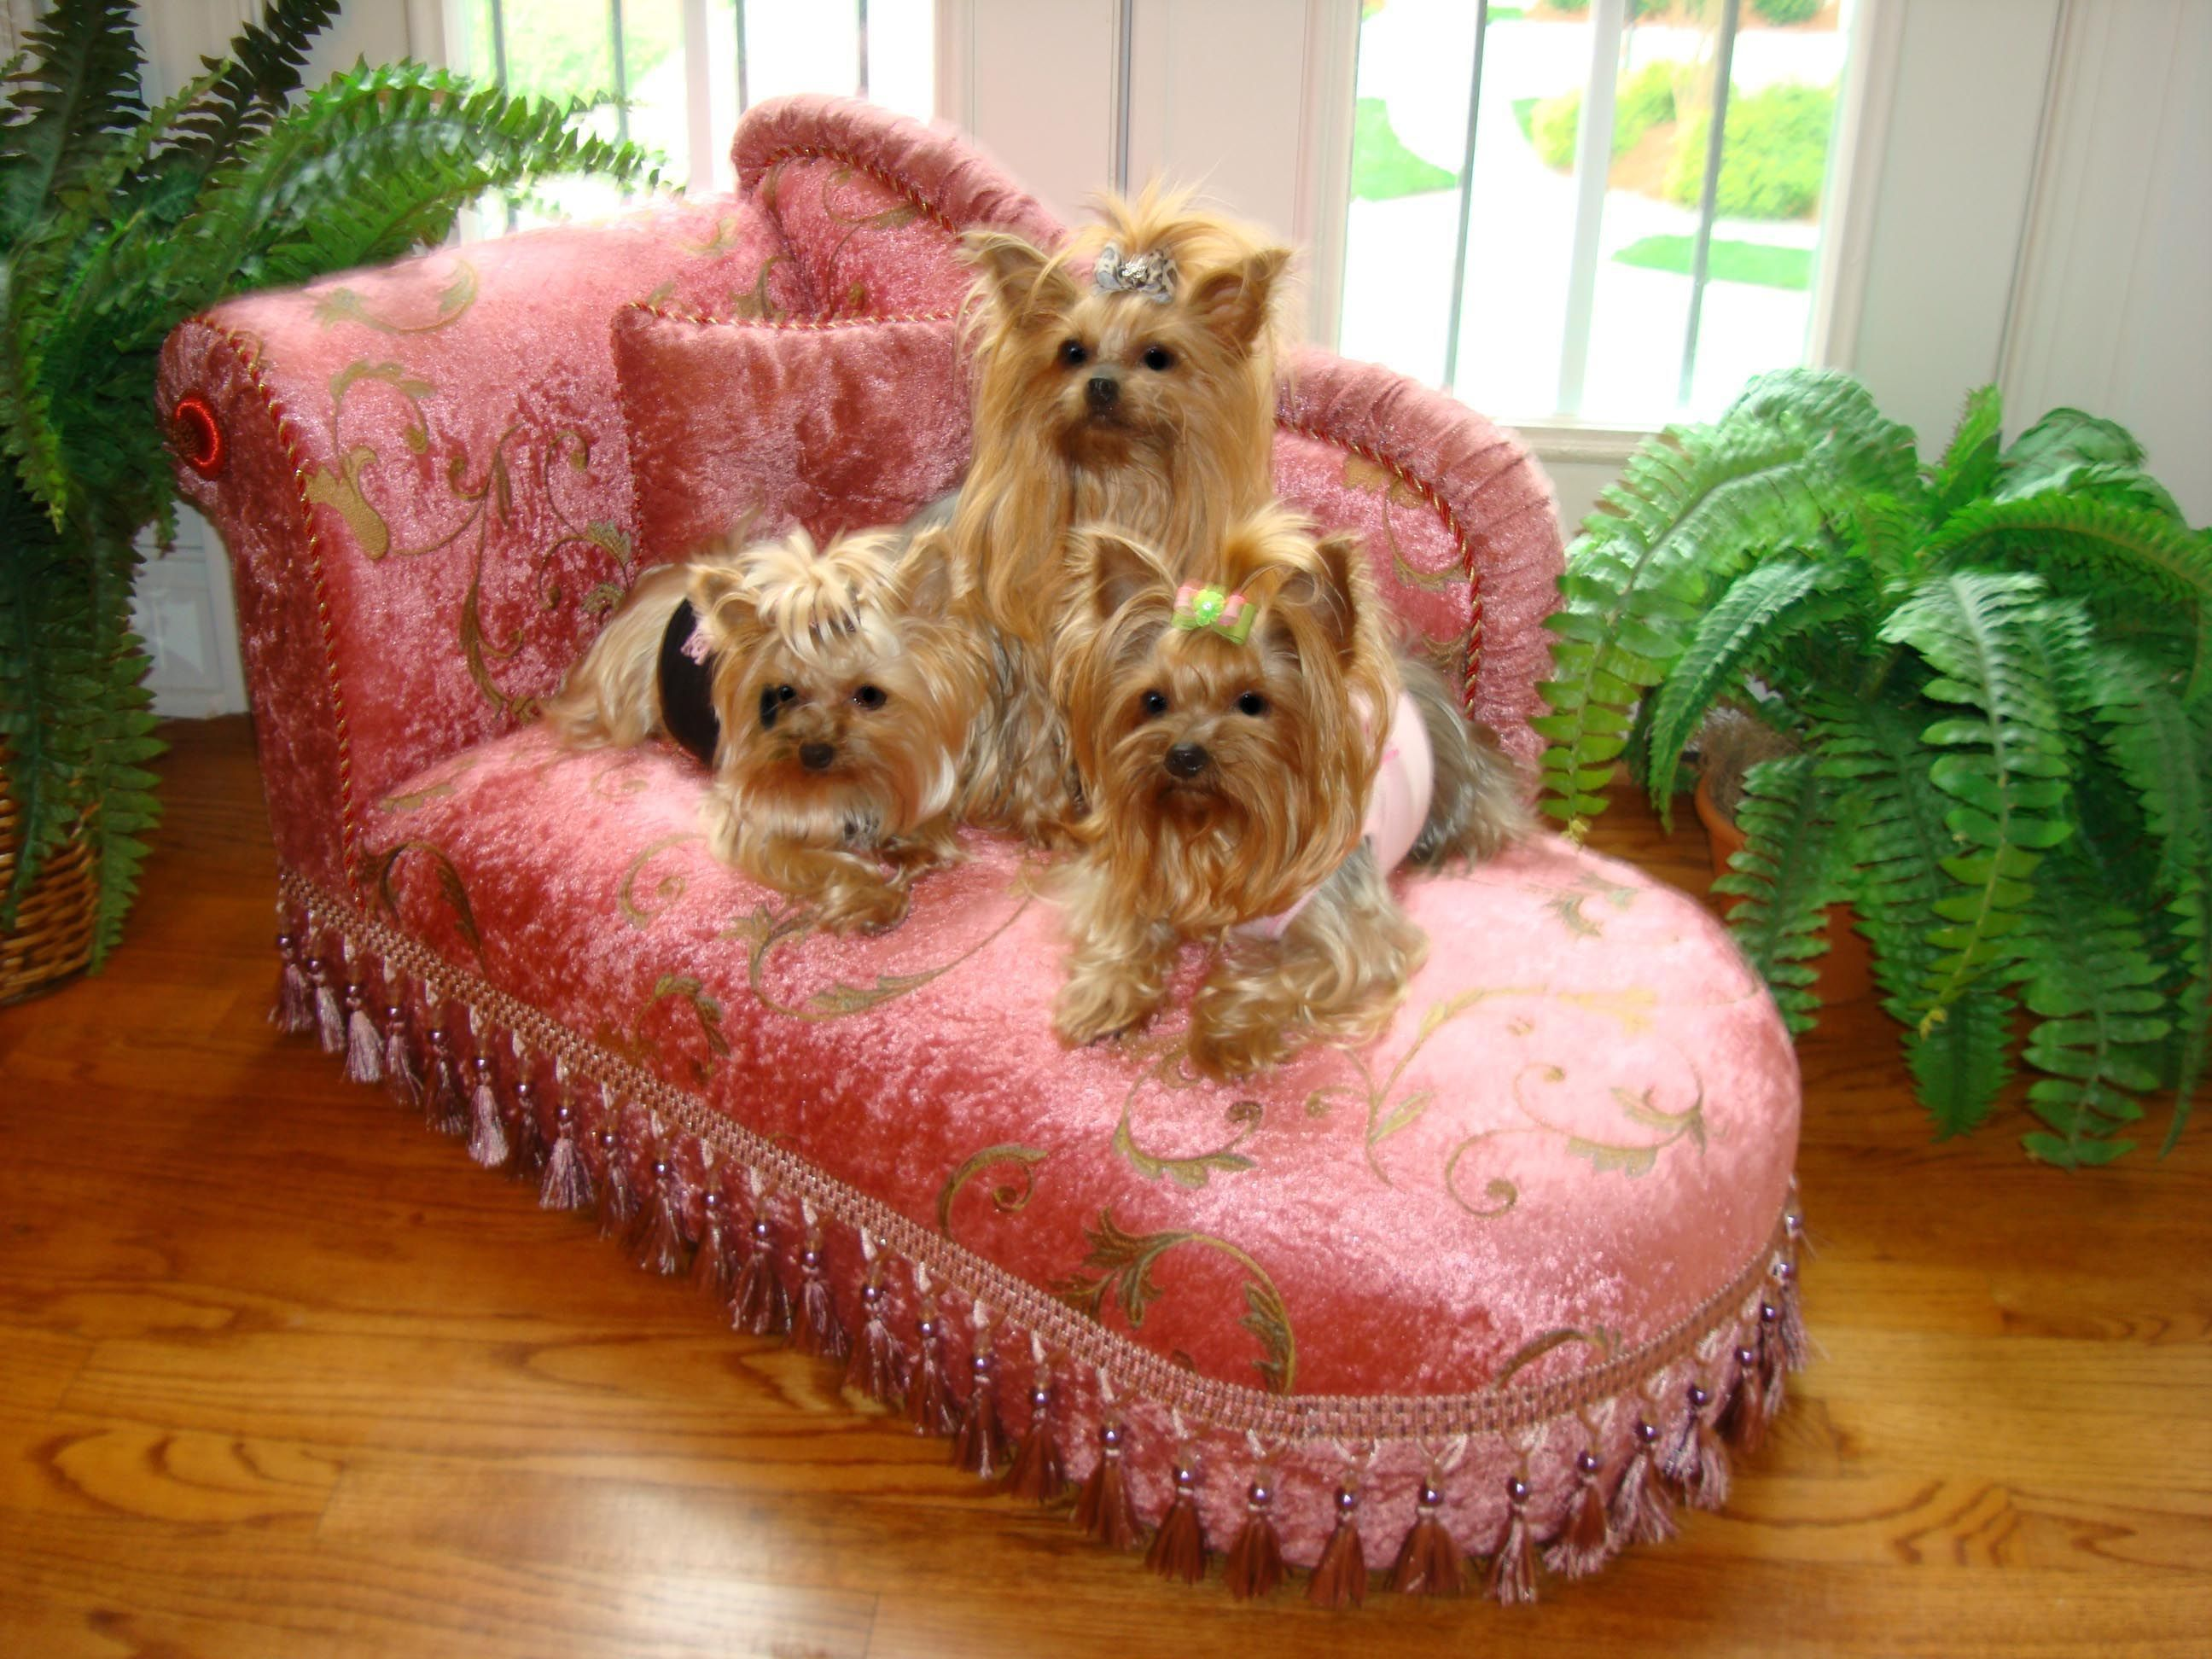 Google Image Result For Http Www Sassyyorkie Com V Vspfiles Assets Images United 2520k 9 2520yorkie 2520chaise 2 2520inch Jpg Yorkie Puppy Yorkie Yorkie Dogs